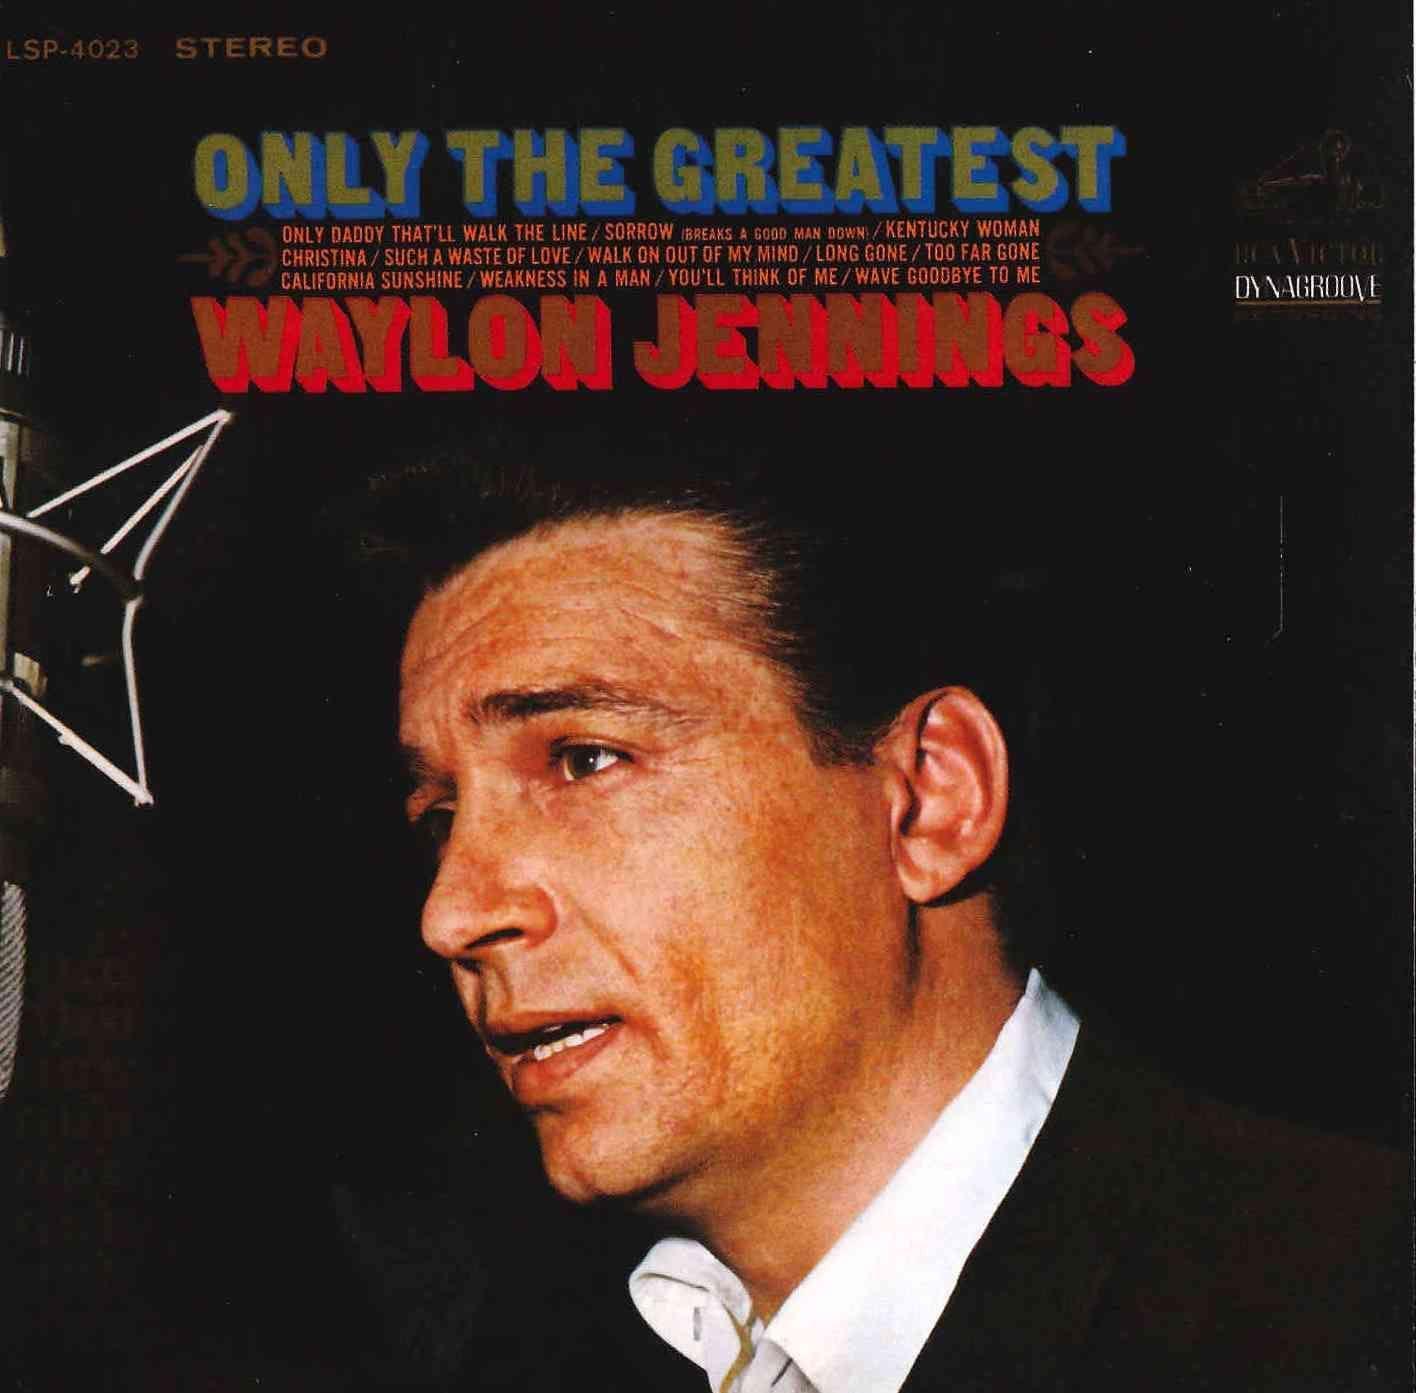 Waylon Jennings - Only The Greatest, Yellow